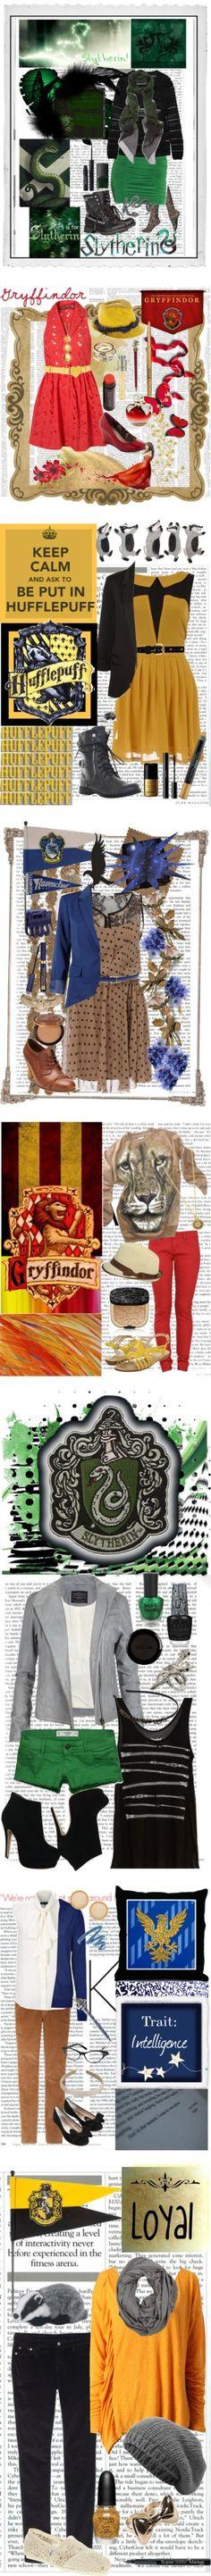 """Hogwarts House: Fashion Inspired"" by selene1arissa1 ❤ liked on Polyvore"